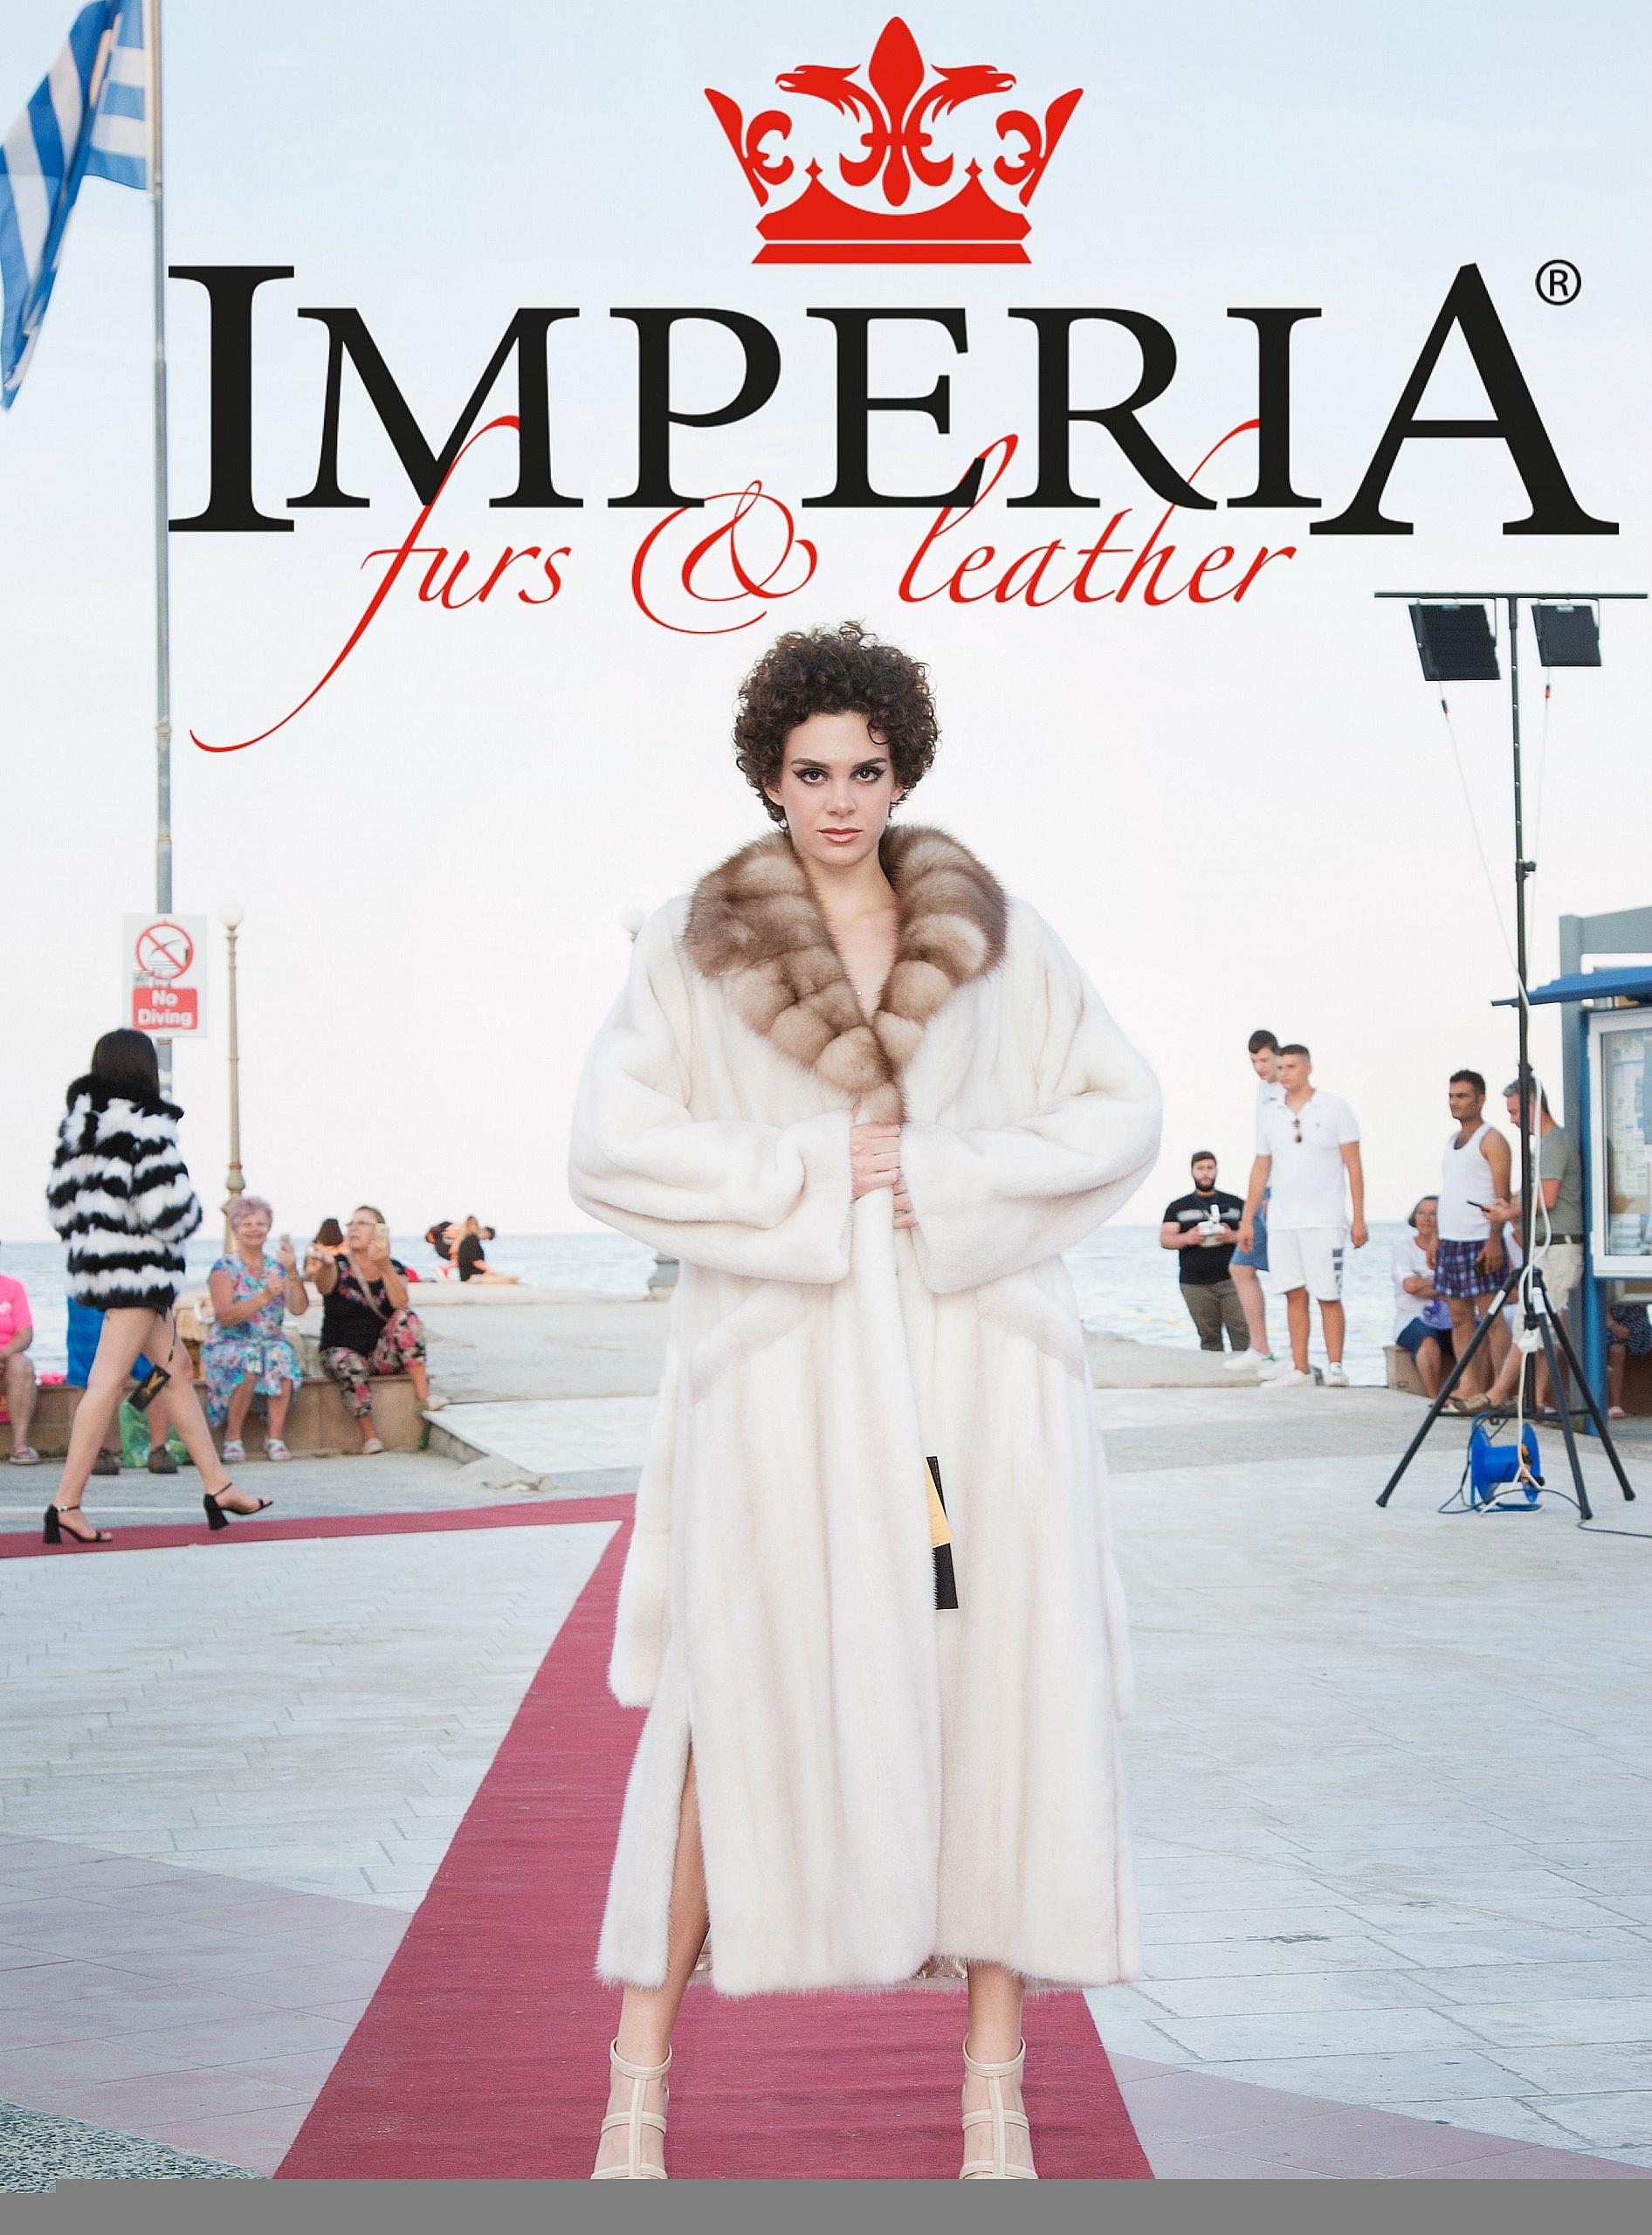 Fur Fashion by the Sea